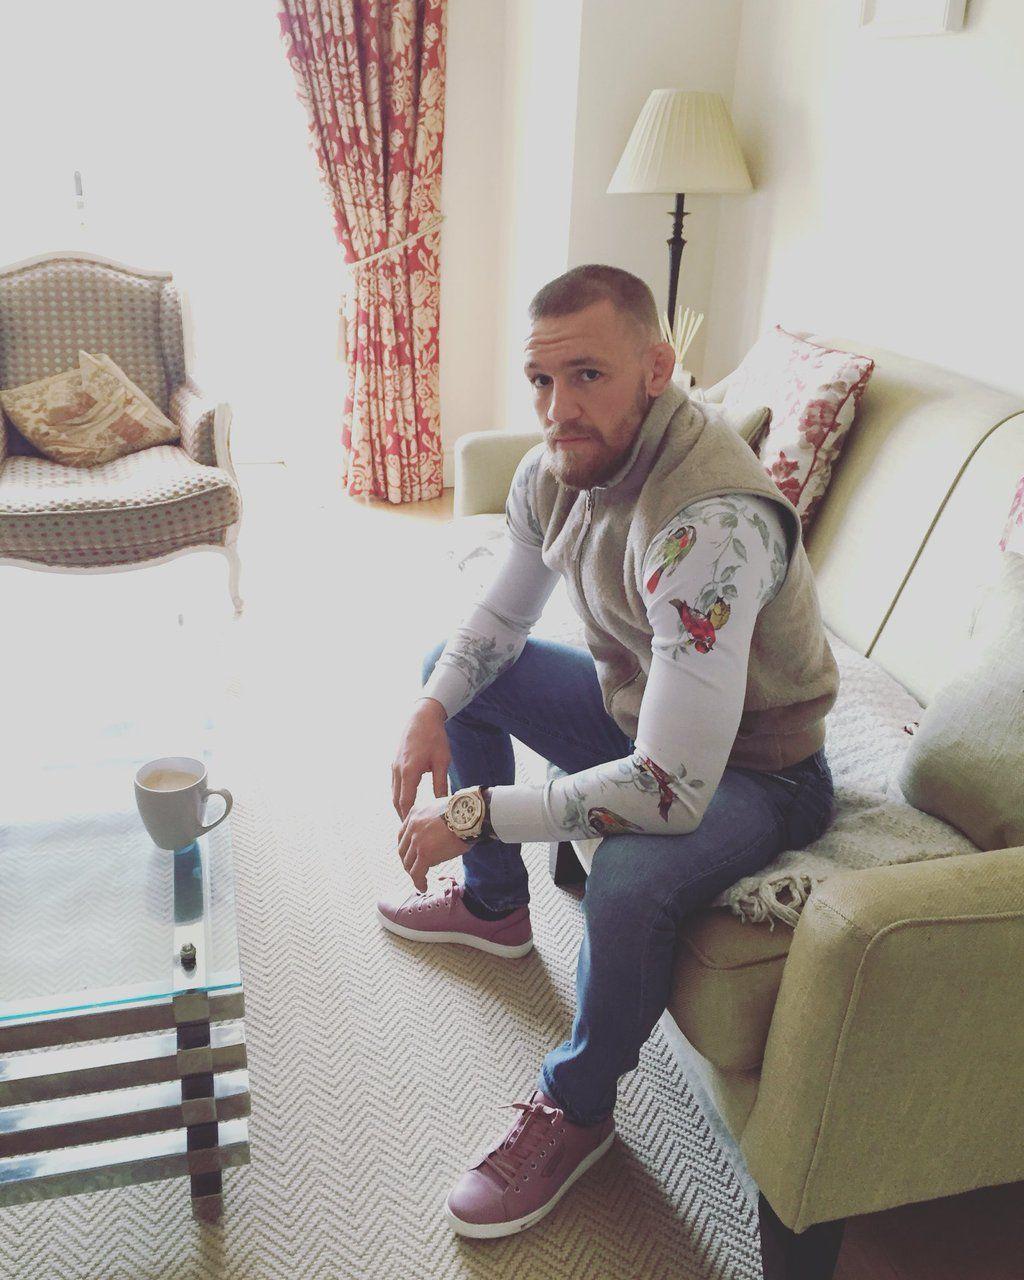 "Conor McGregor on Twitter: ""Today's money shot with today's triple shot! #TheFruits #EnjoyThem https://t.co/DqpqKZGivj"""